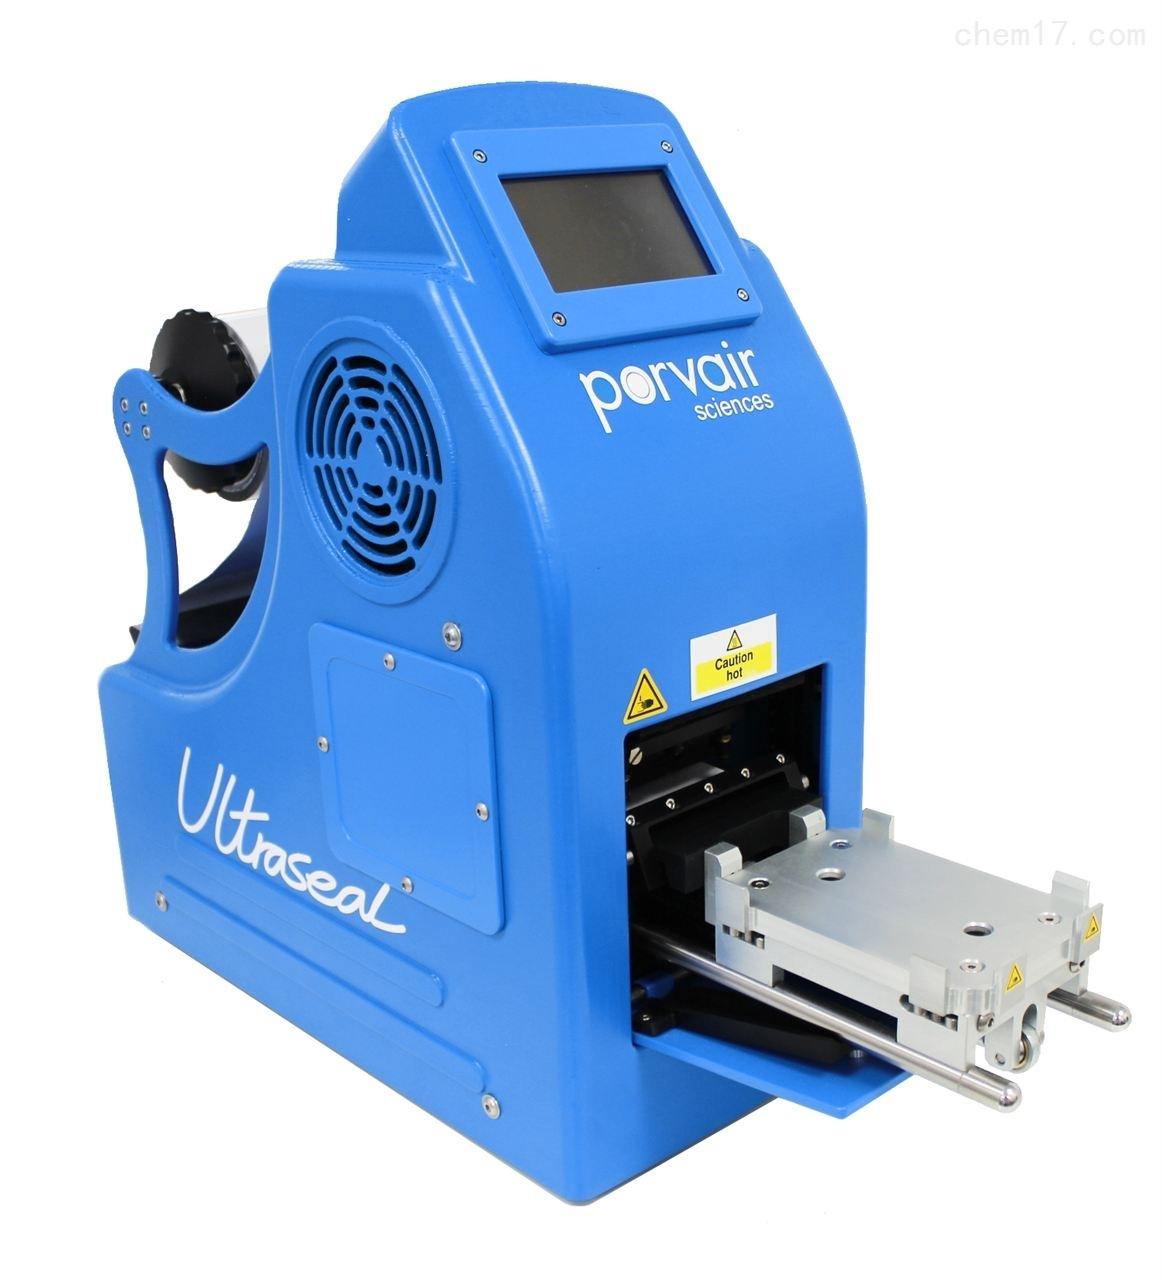 Ultraseal Pro全自动热封膜机